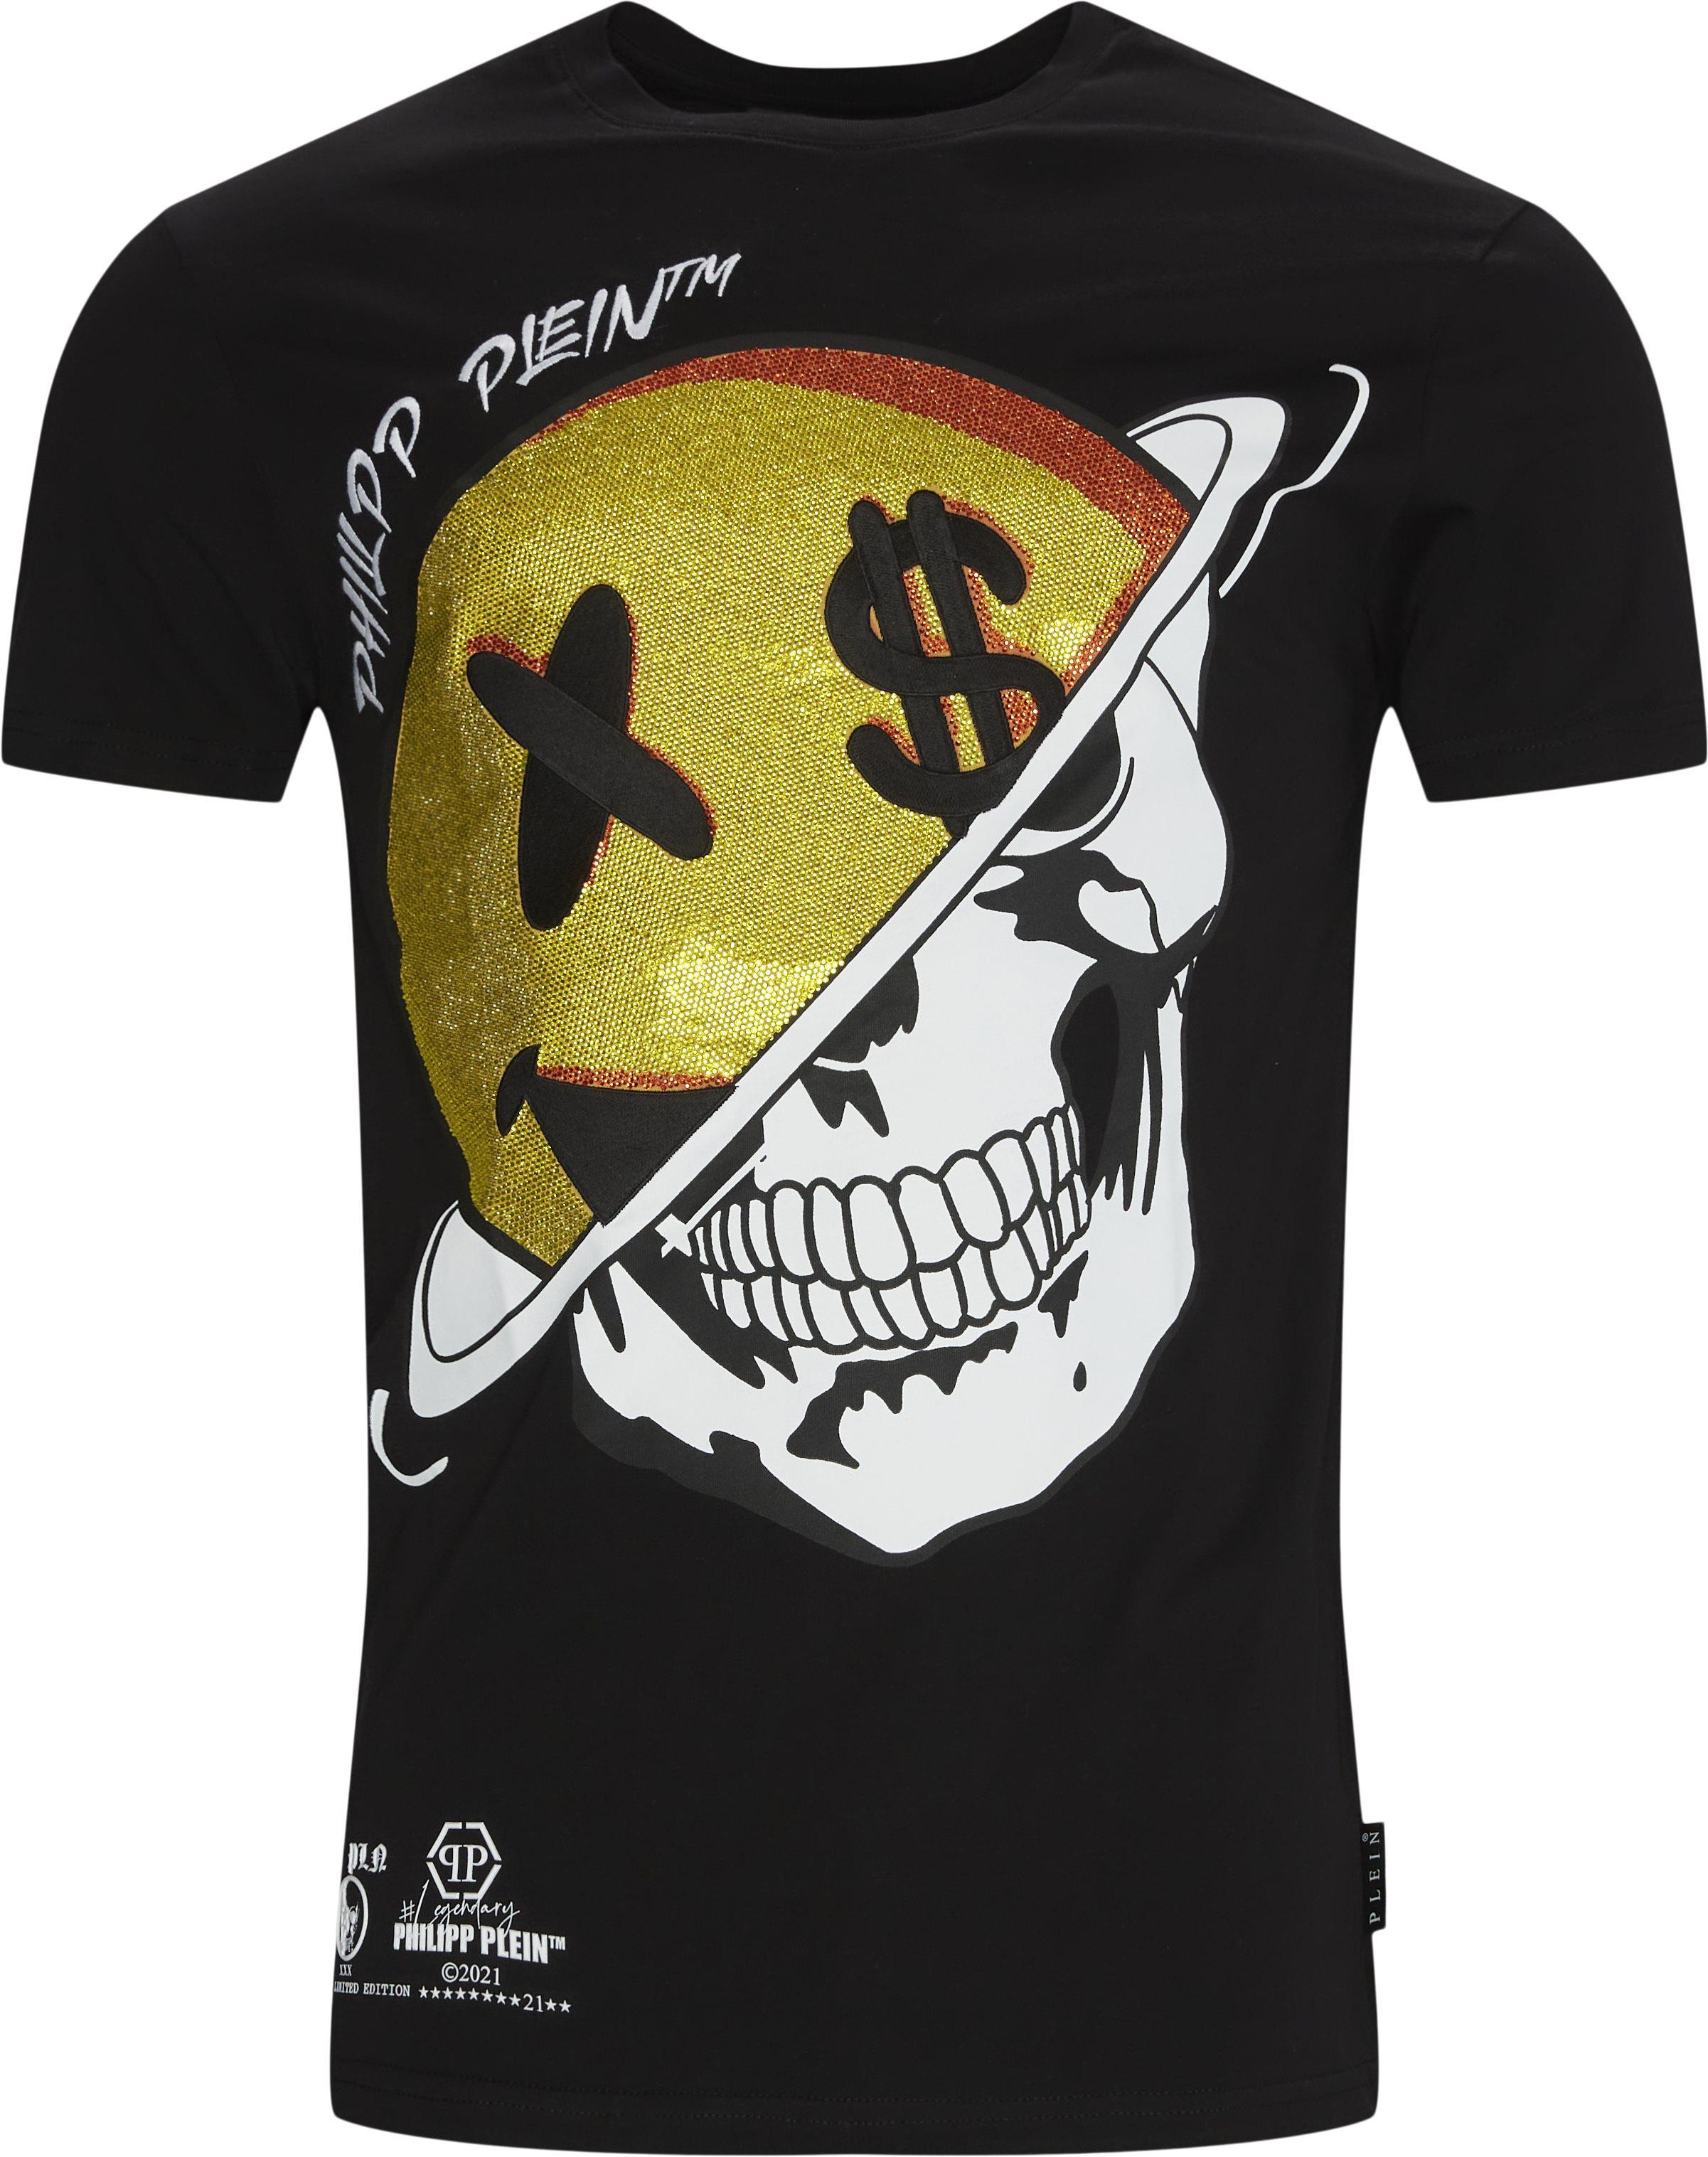 T-shirts - Loose fit - Black